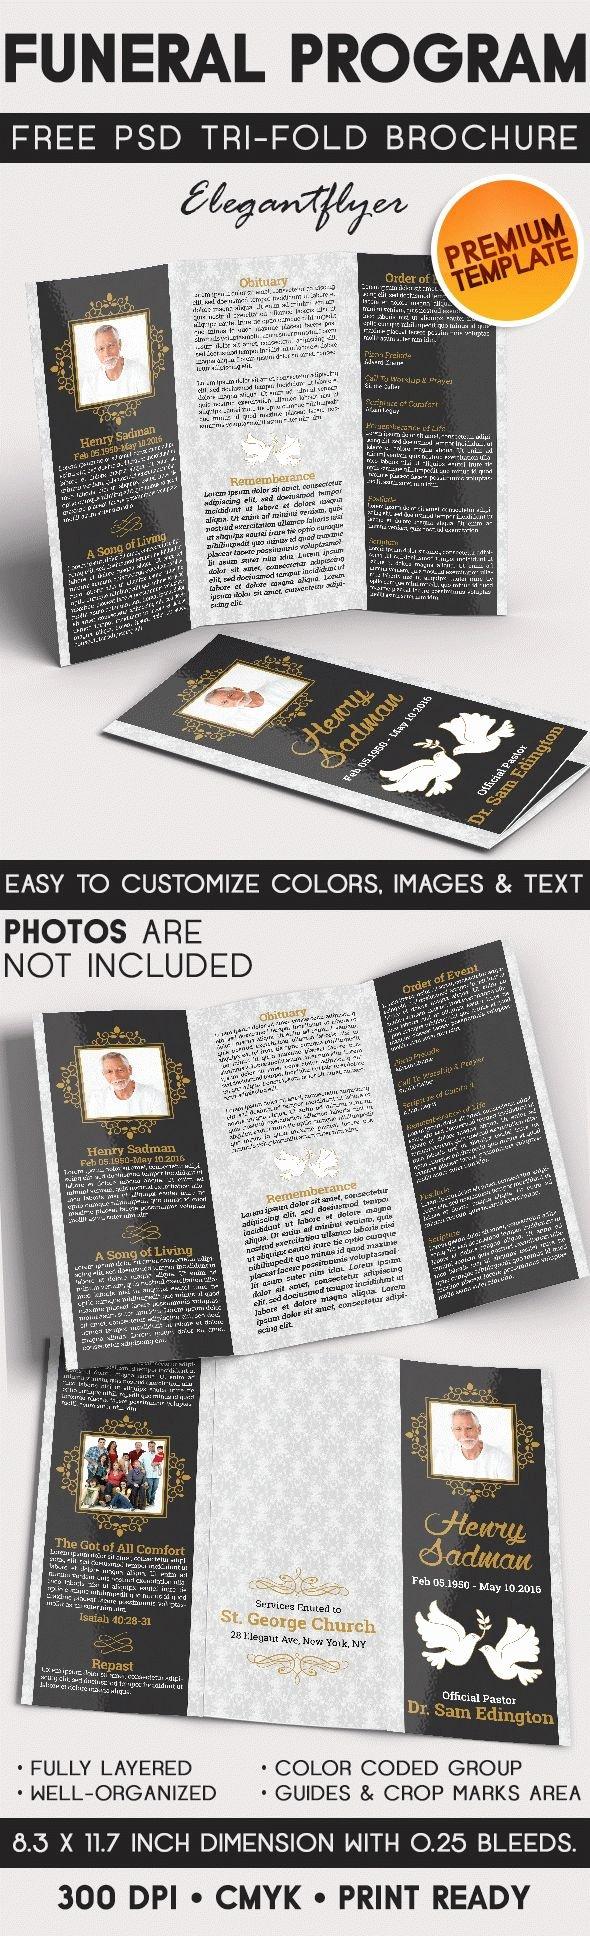 Memorial Pamphlet Template Free New Tri Fold Brochure for Funeral Program – by Elegantflyer